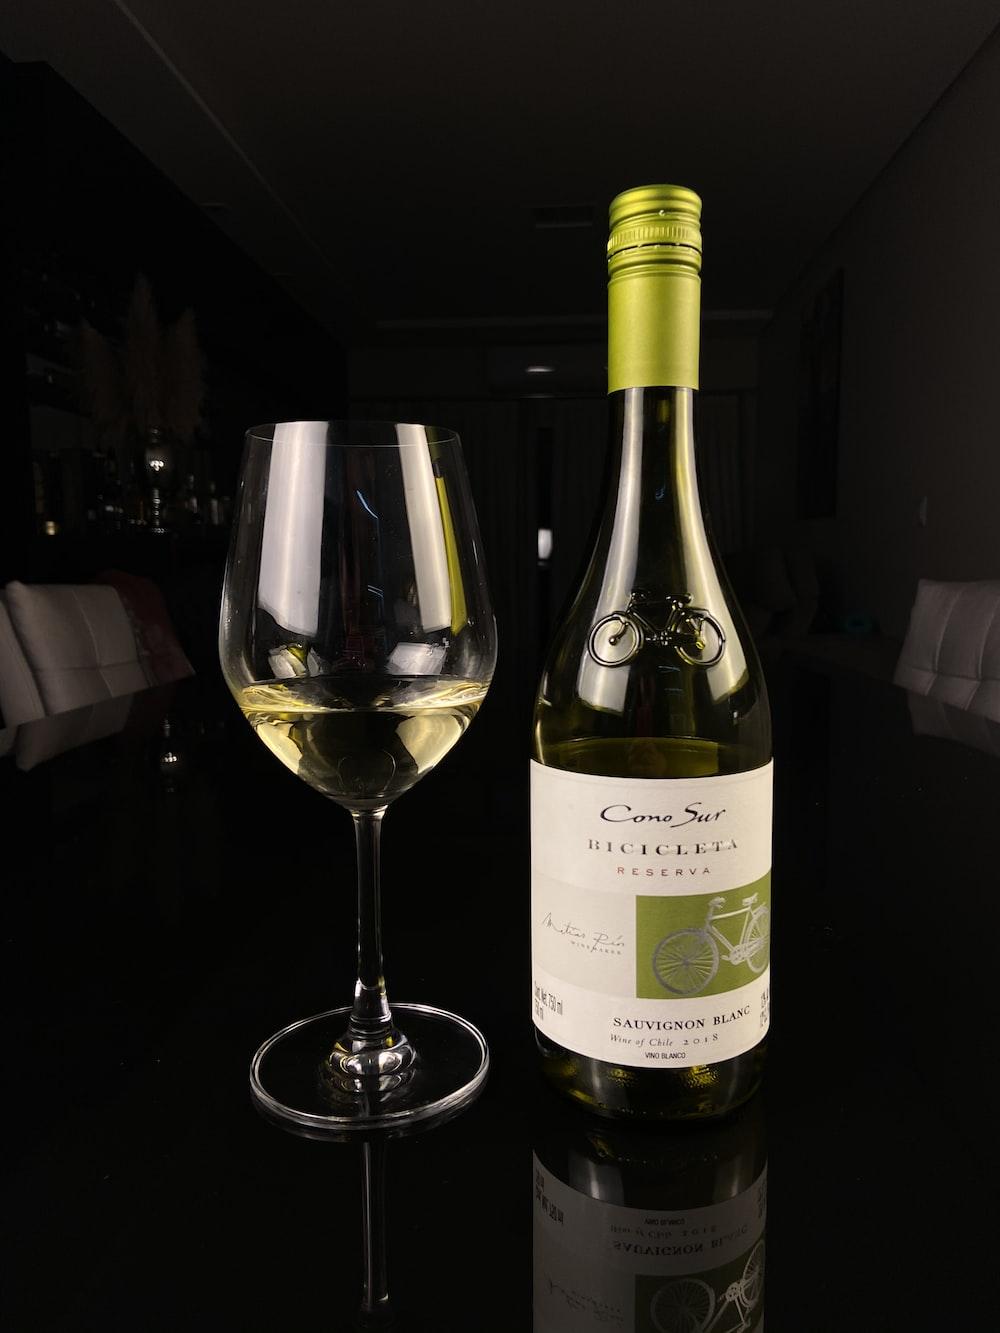 white labeled bottle beside wine glass